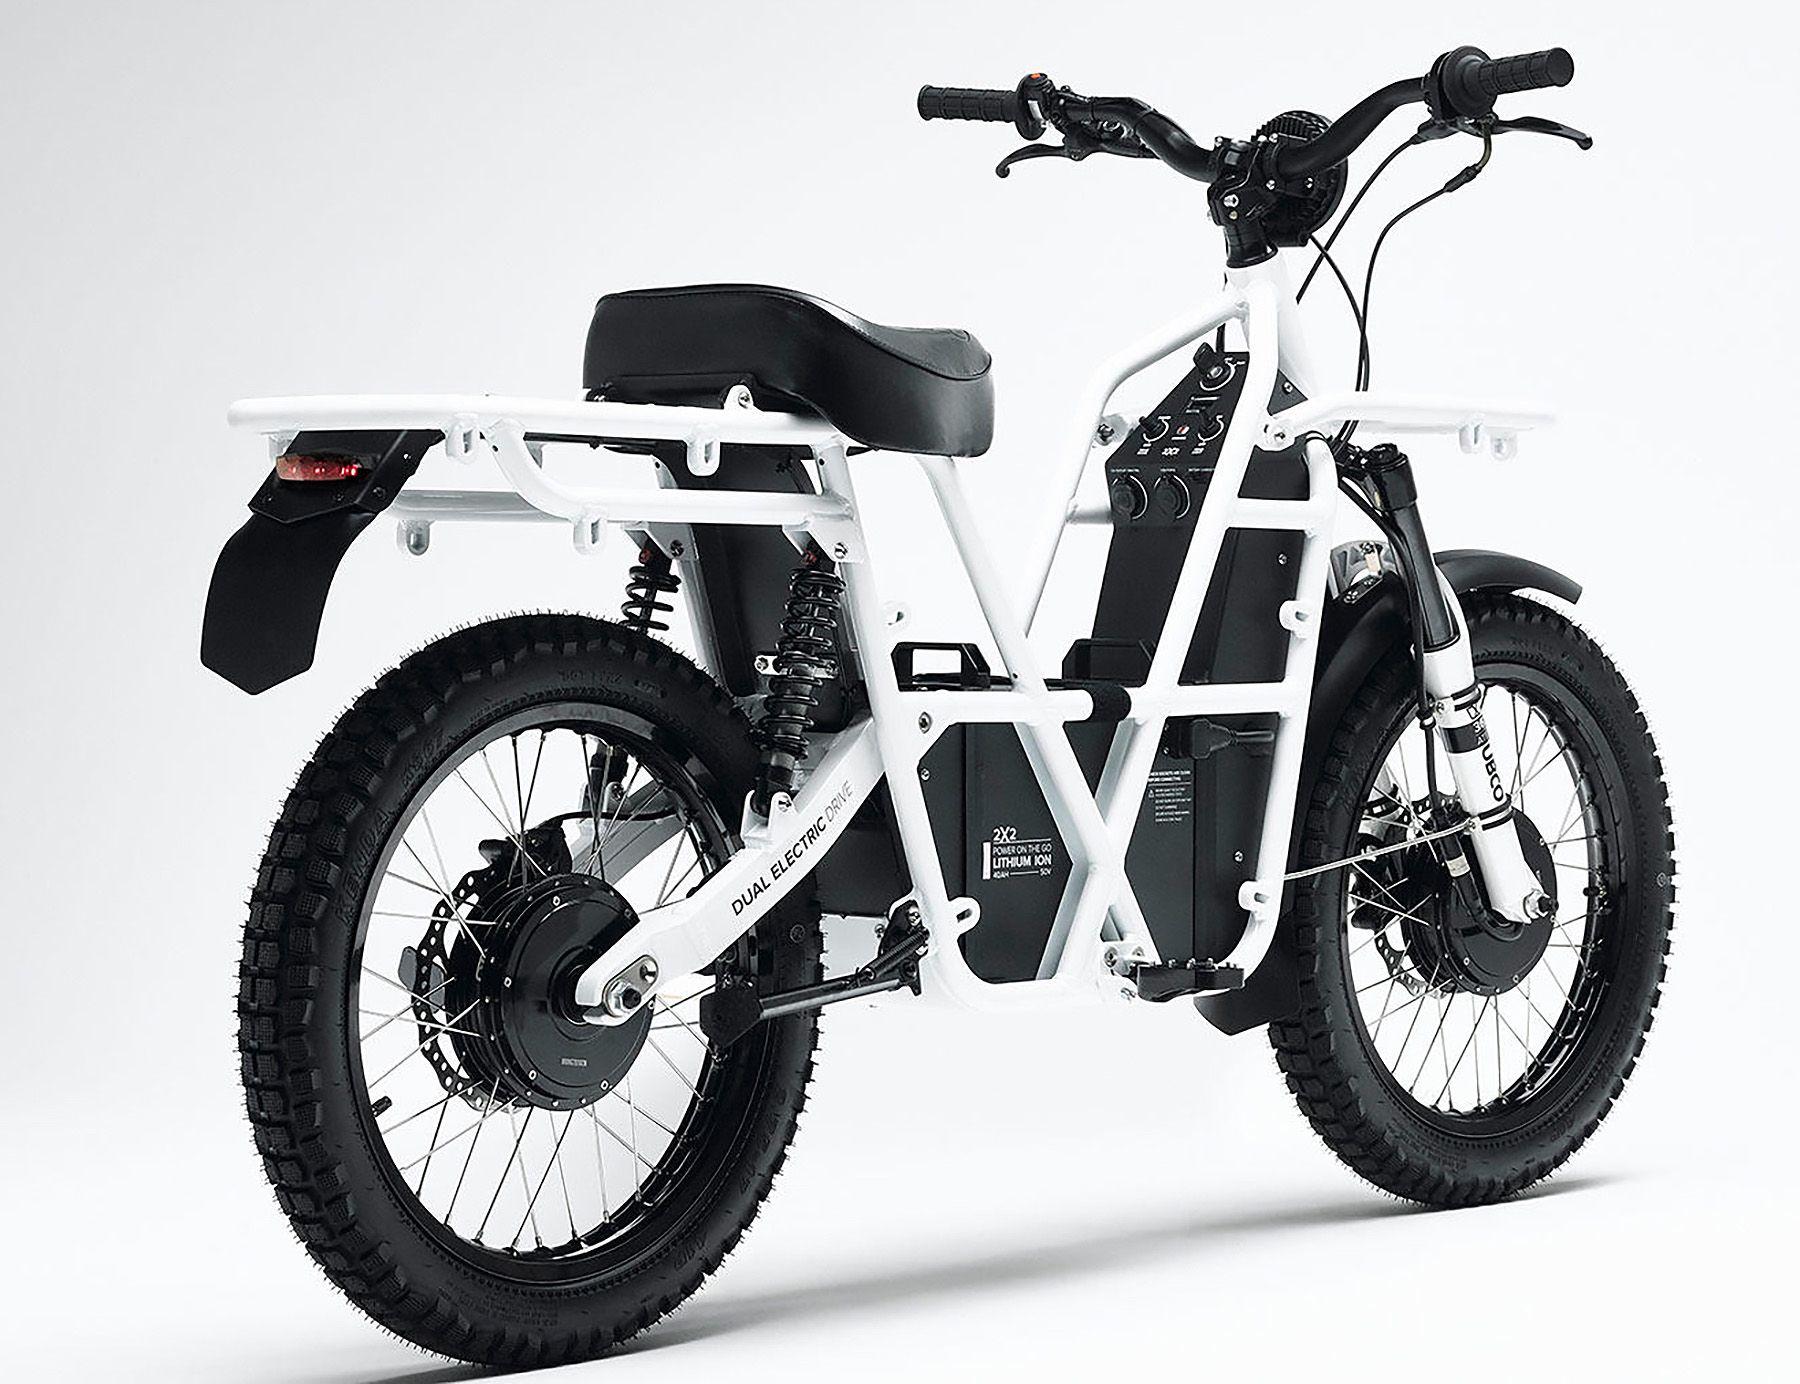 Elektro Dirt Bike Ubco 2x2 2019 Motorrad Mofa Autos